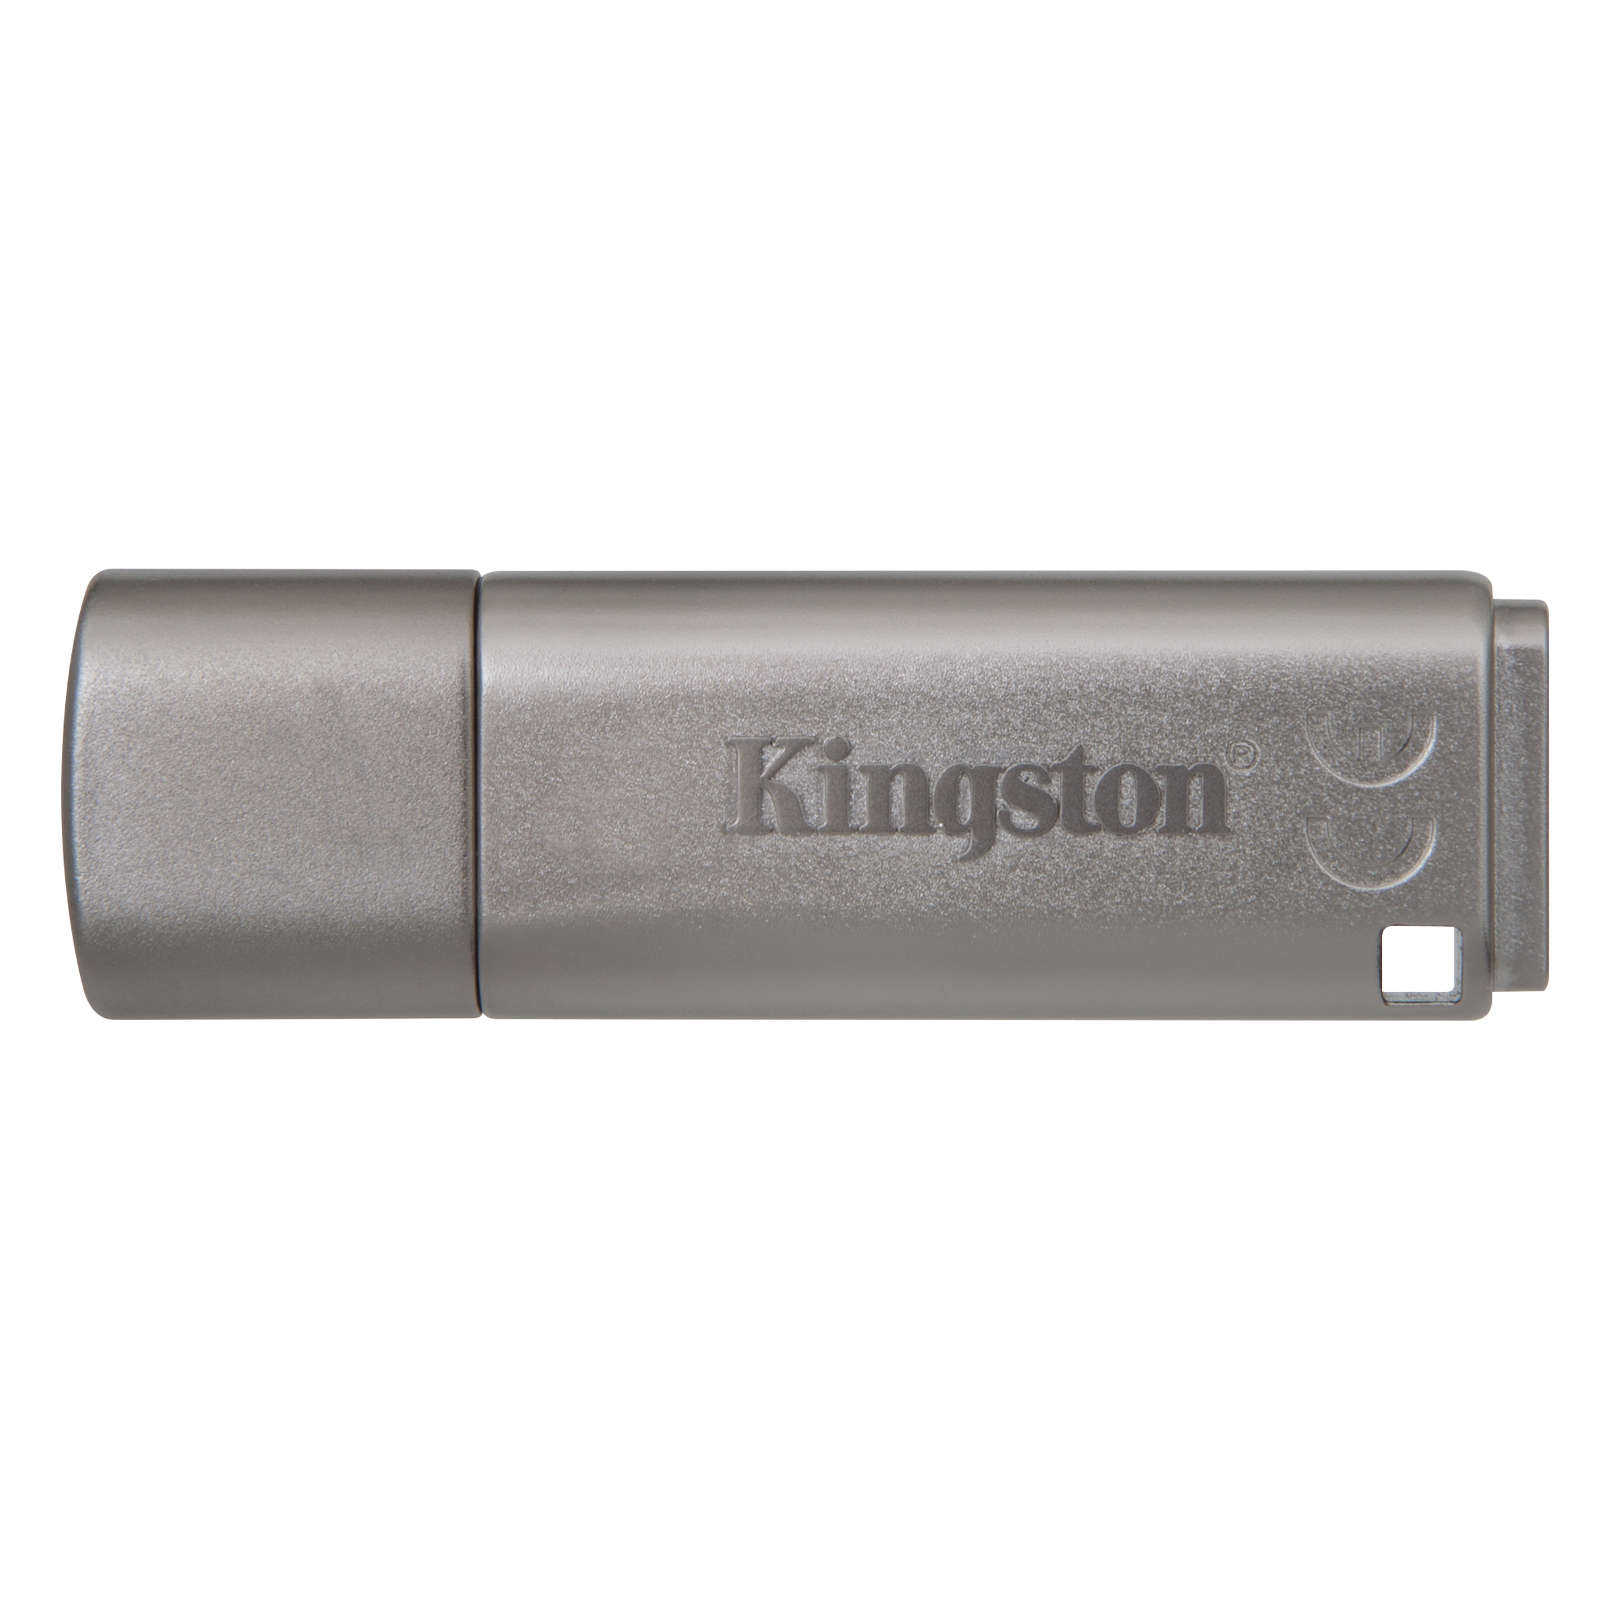 Clé USB Kingston DataTraveler Locker+ G3 - 64 Go Clé USB sécurisé 64 Go USB 3.0 (garantie constructeur 5 ans)